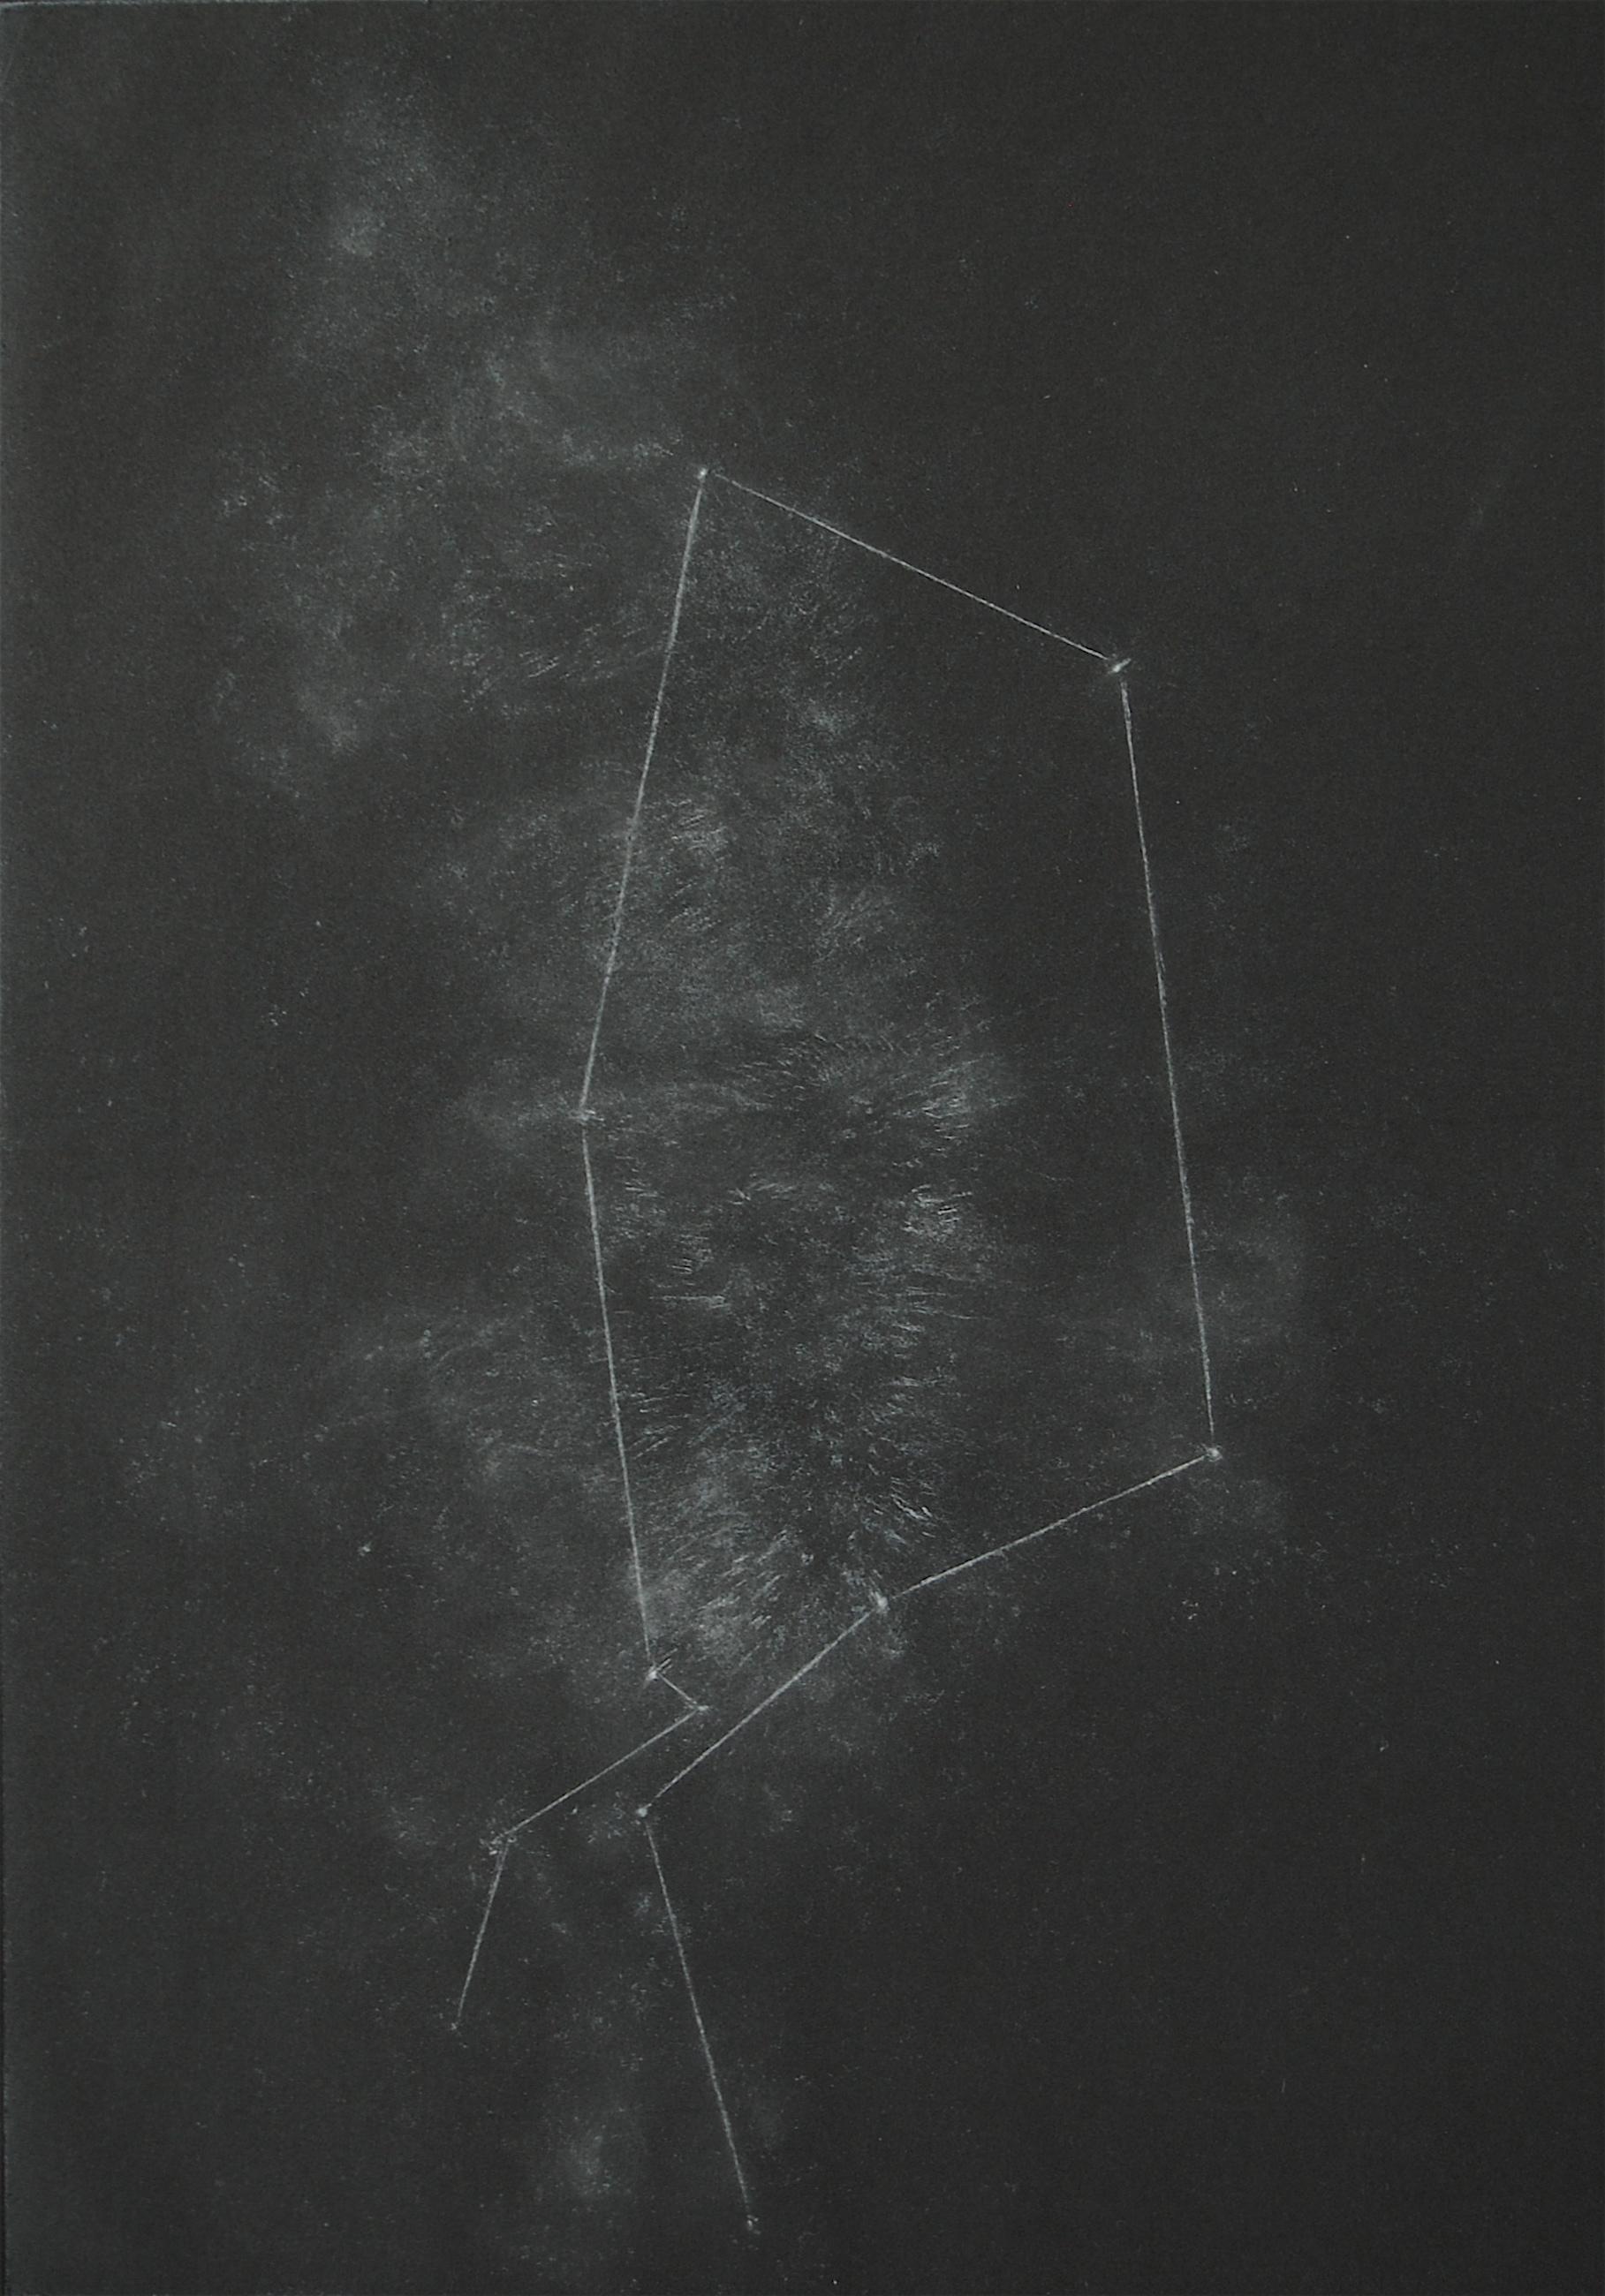 Constellation No. 90 - The Church